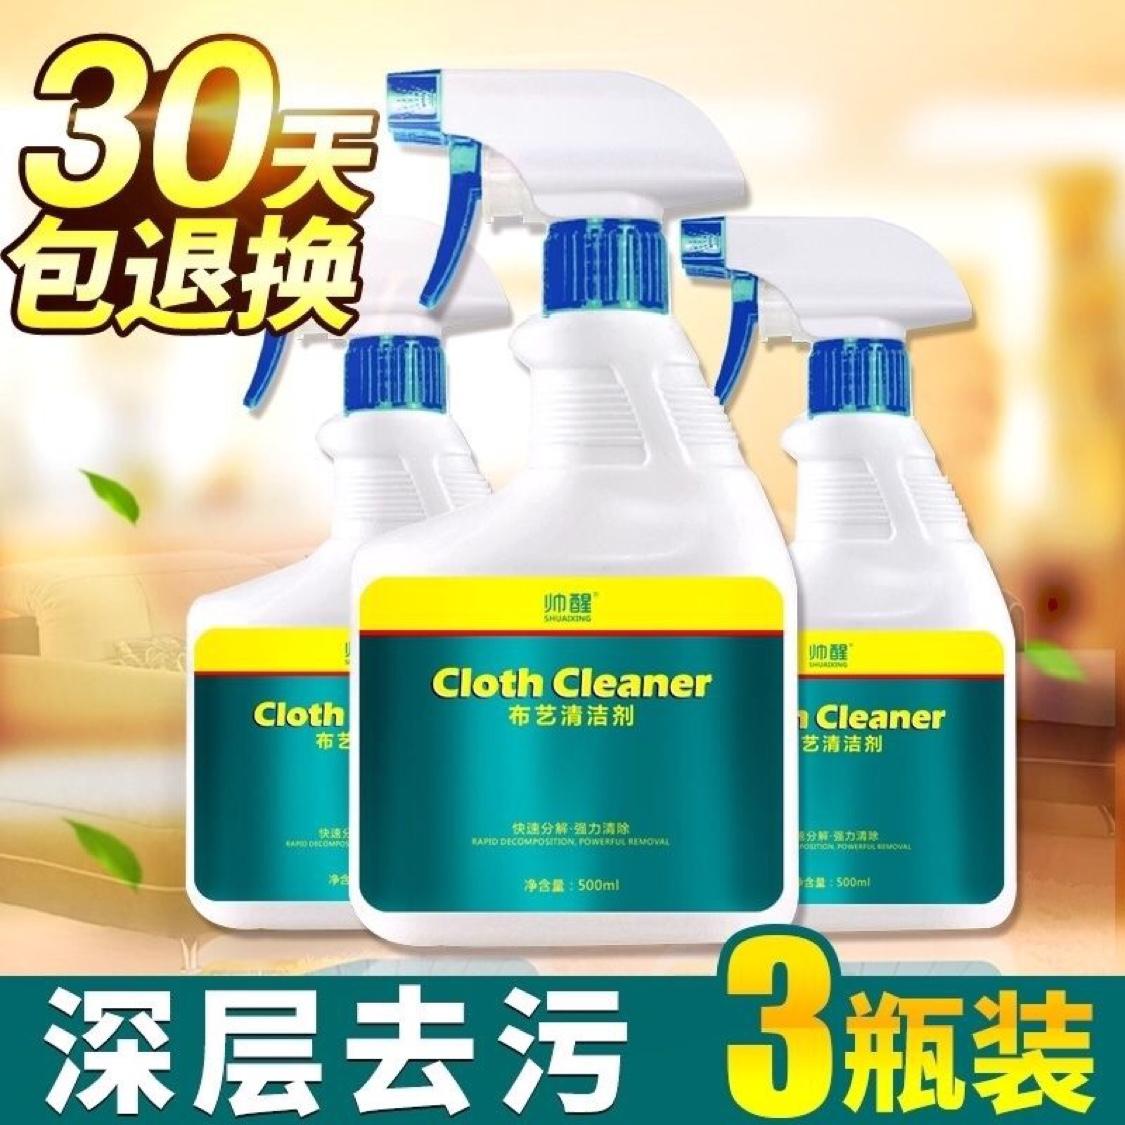 Средства для очистки мебели Артикул 571660496909